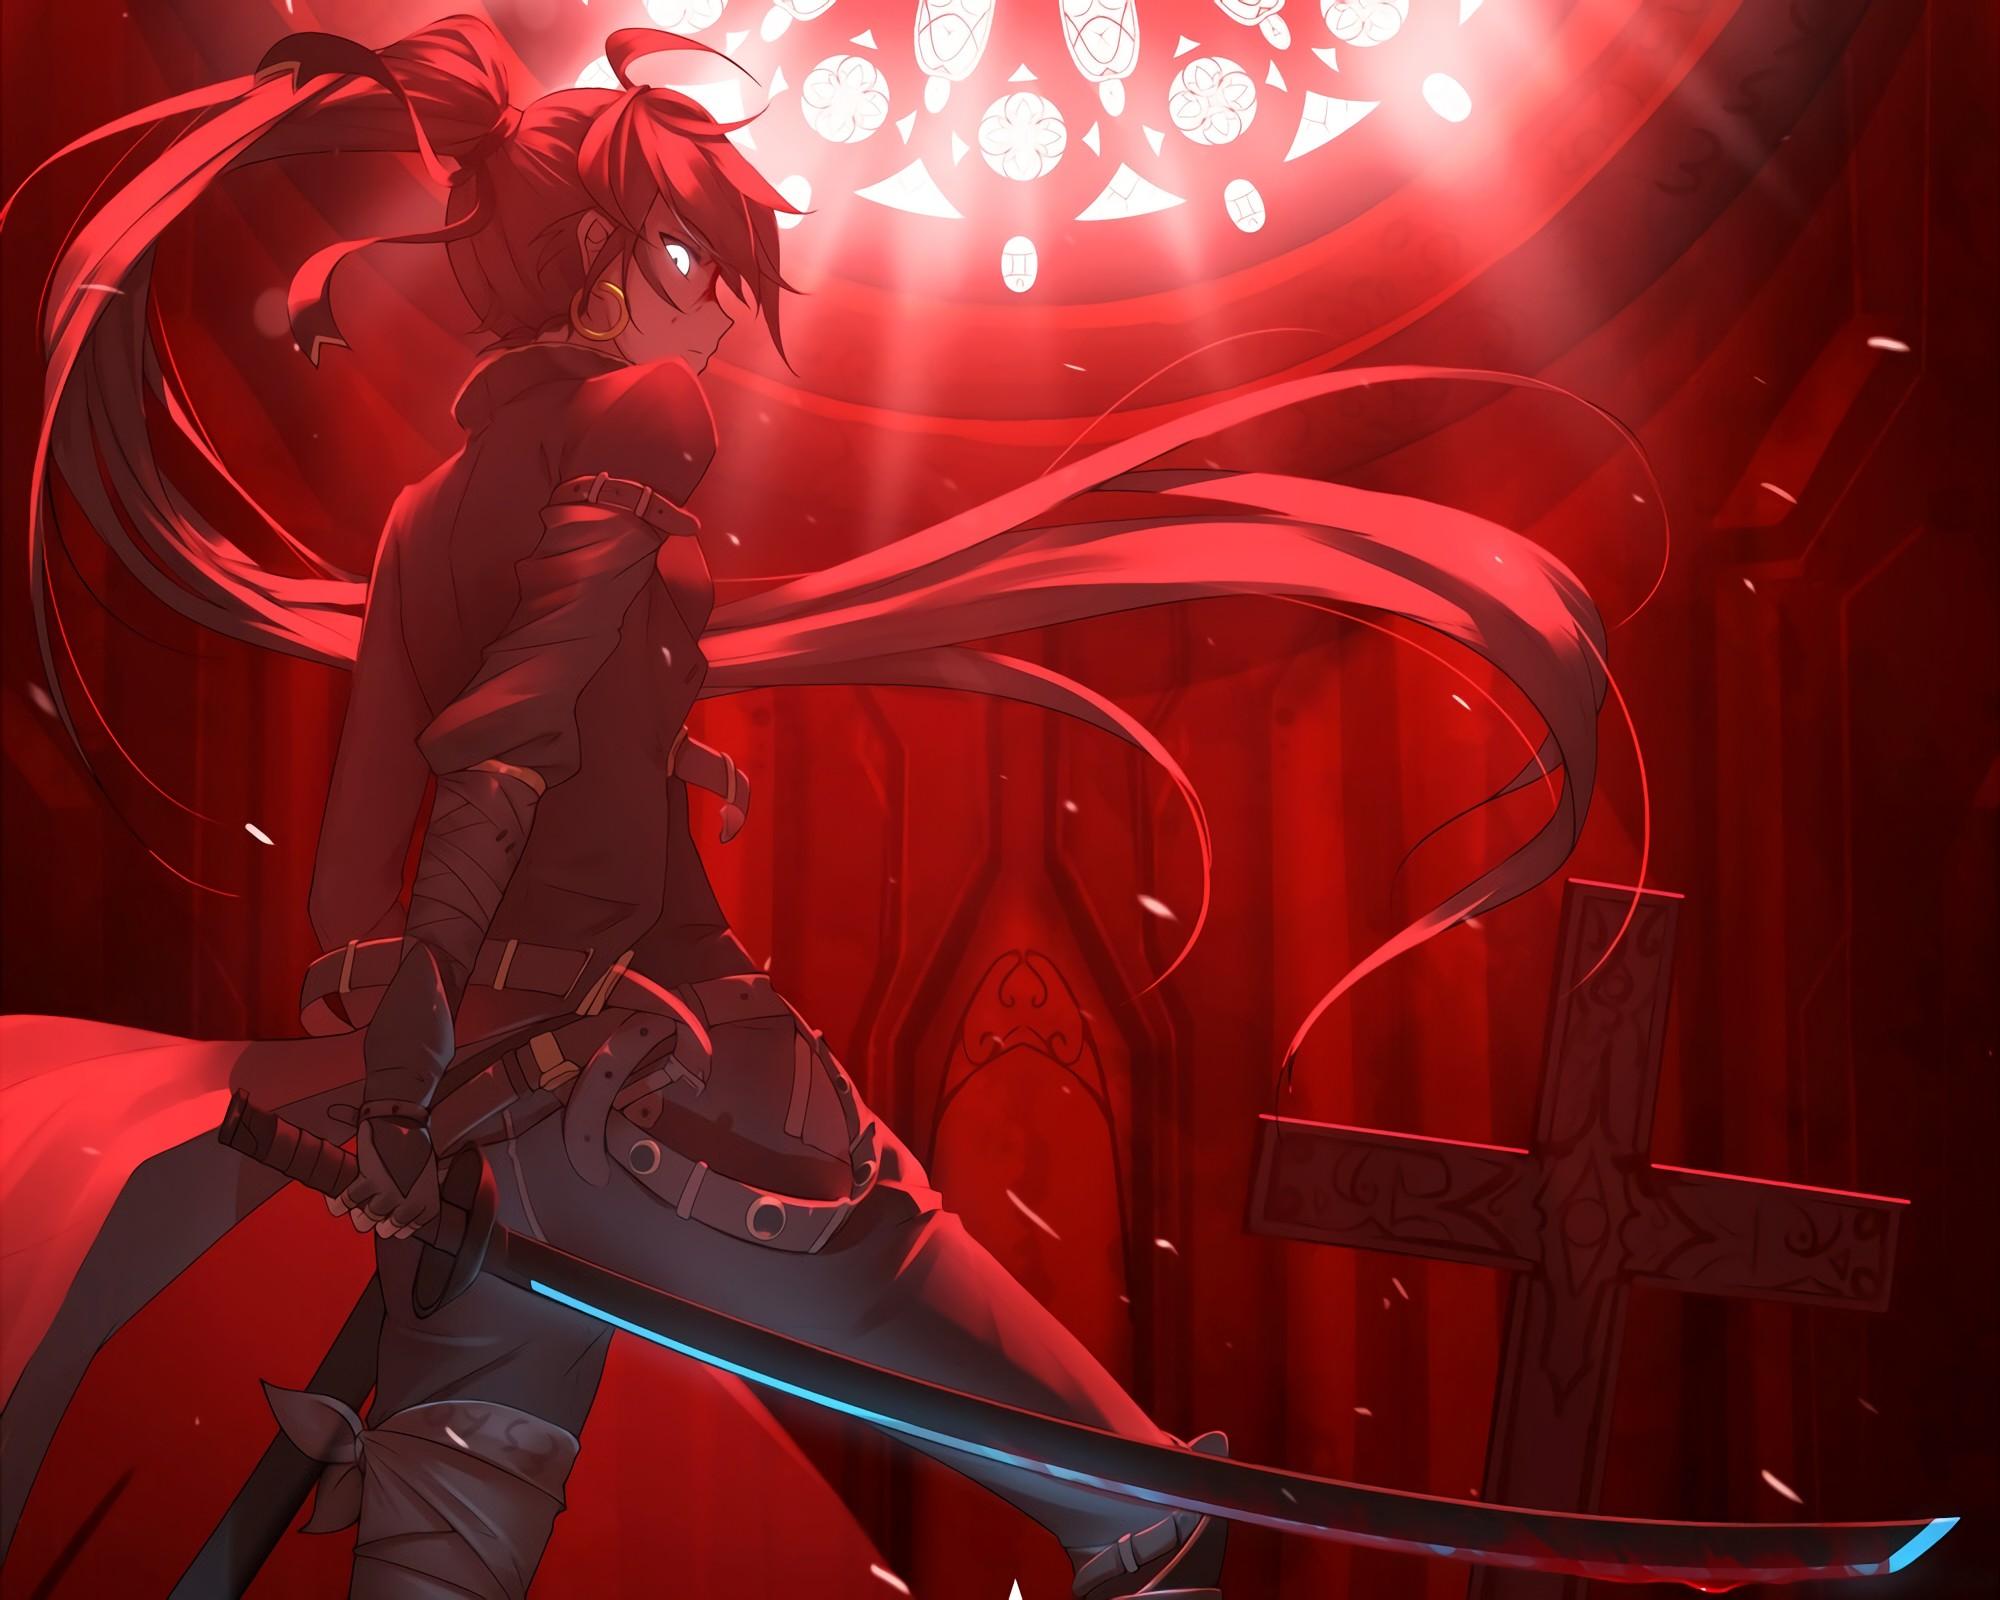 Long hair redhead anime anime girls blood cross - Girl with sword wallpaper ...